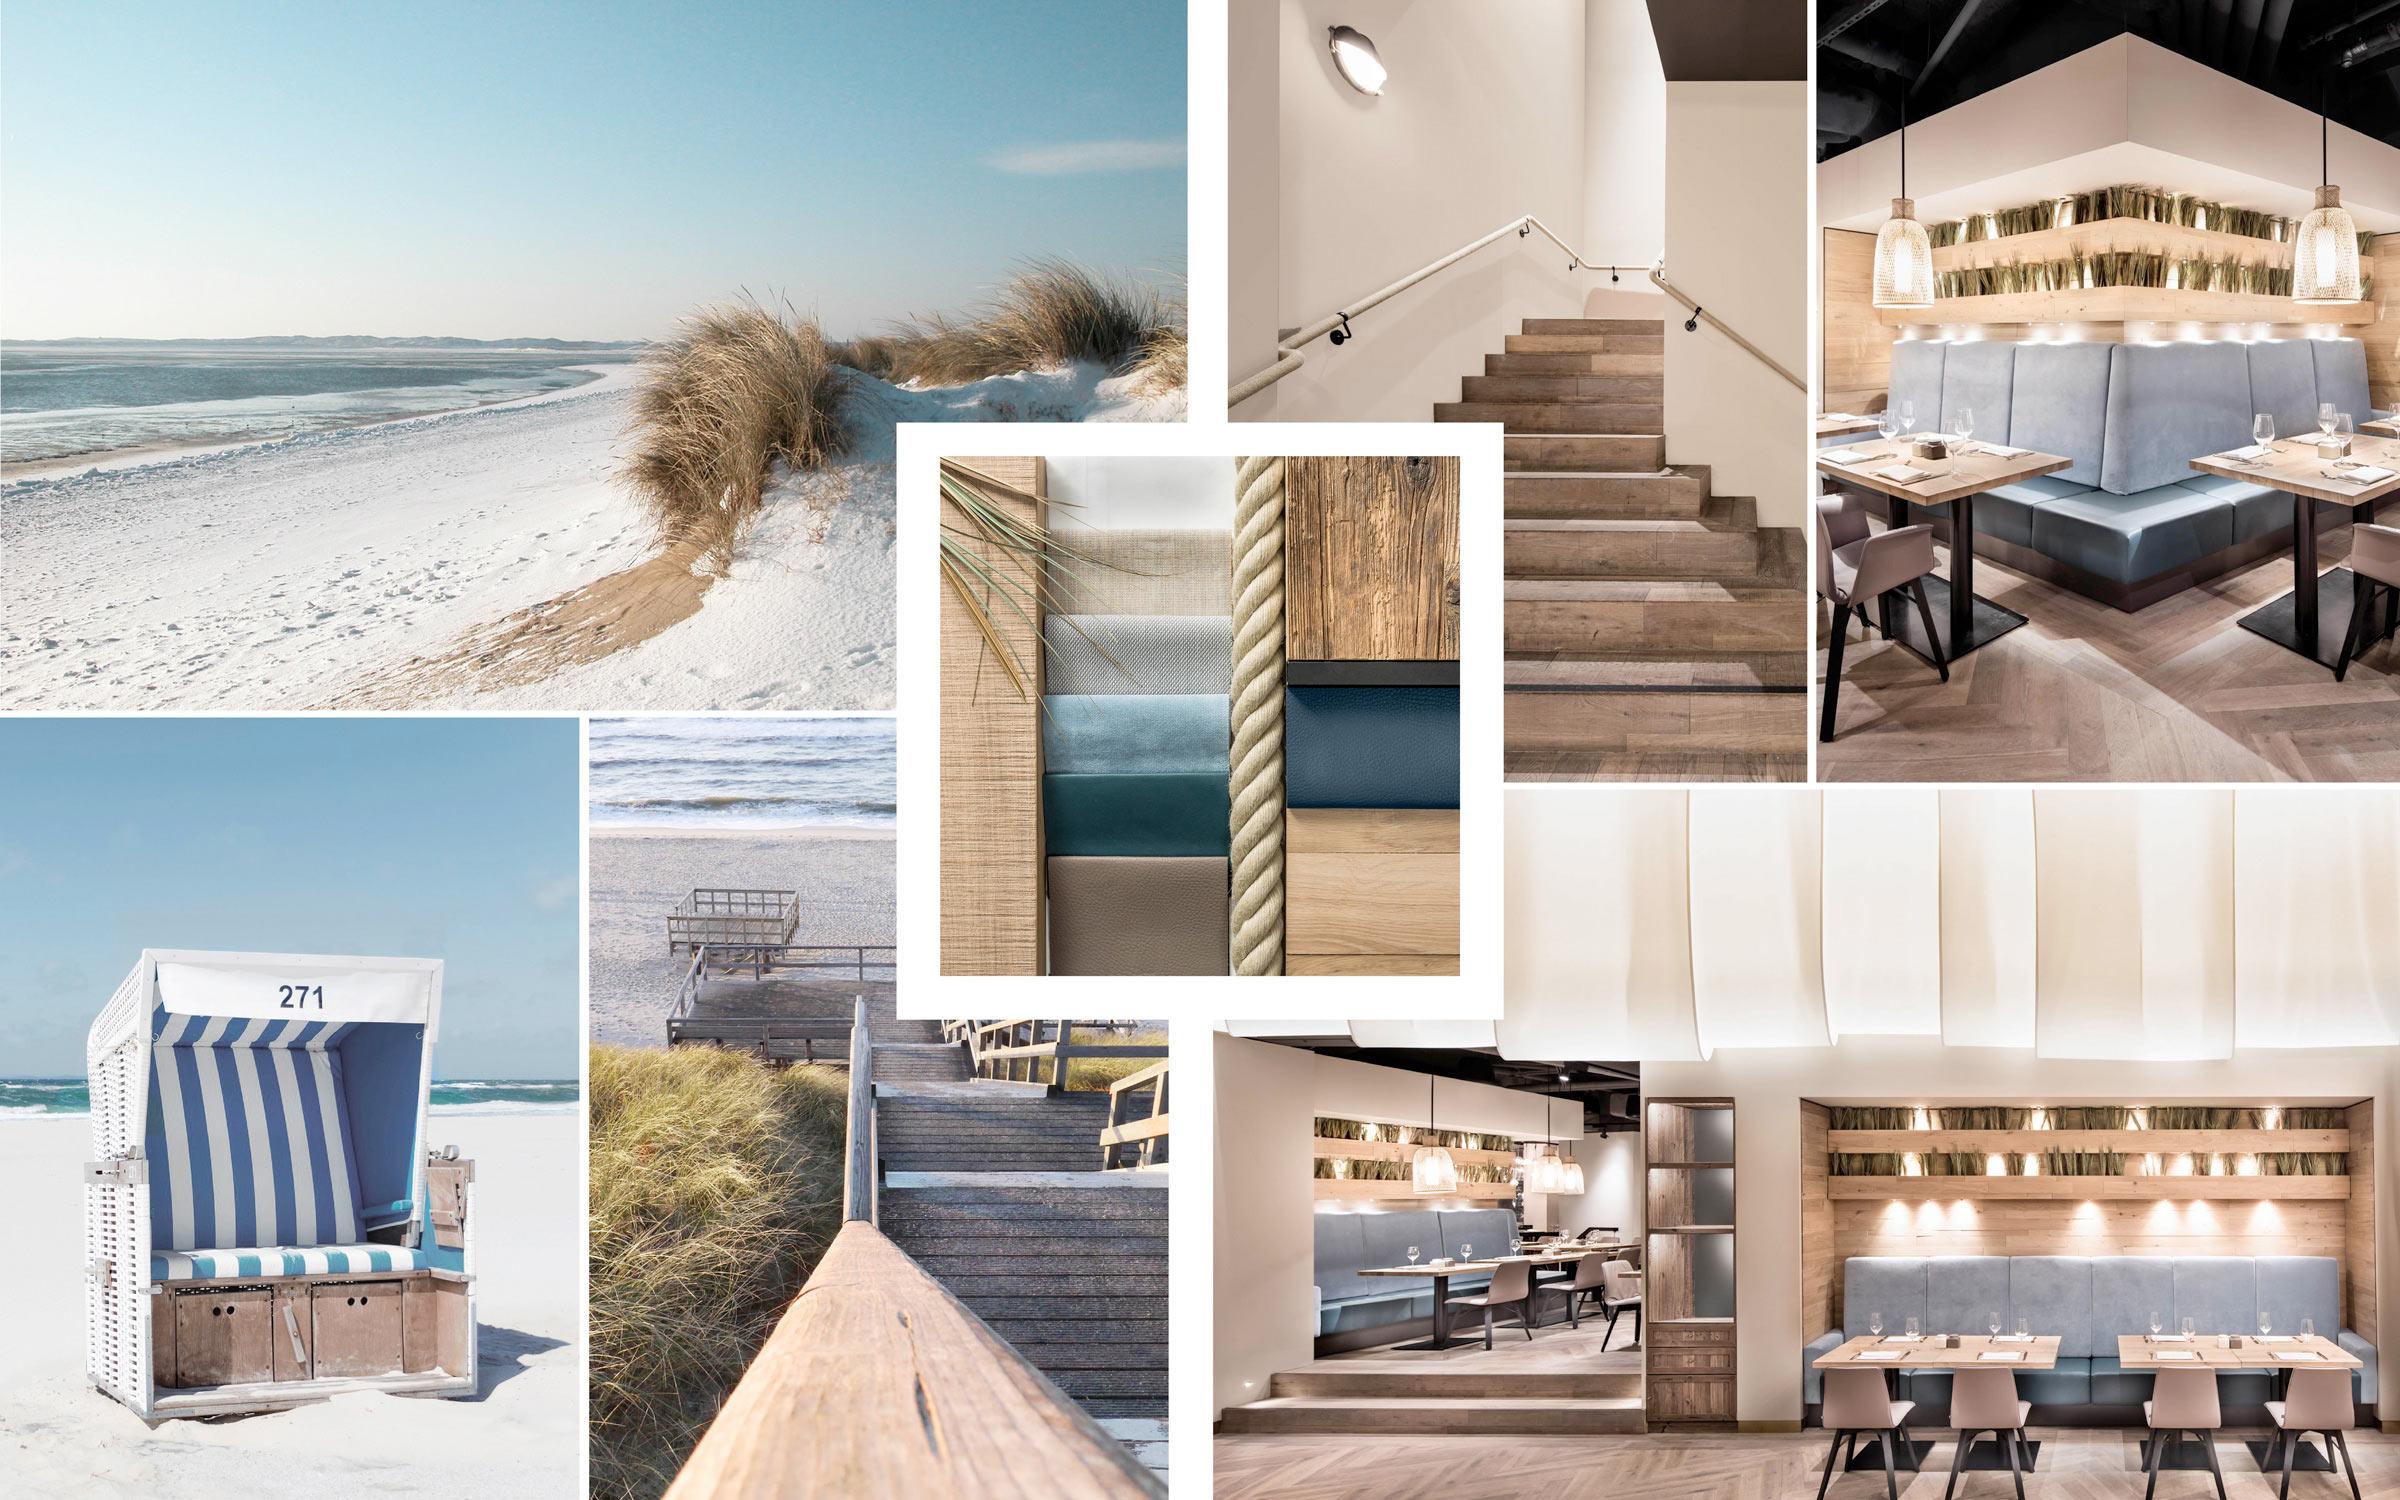 sansibar by breuninger stuttgart inspiration sylt dia dittel architekten. Black Bedroom Furniture Sets. Home Design Ideas